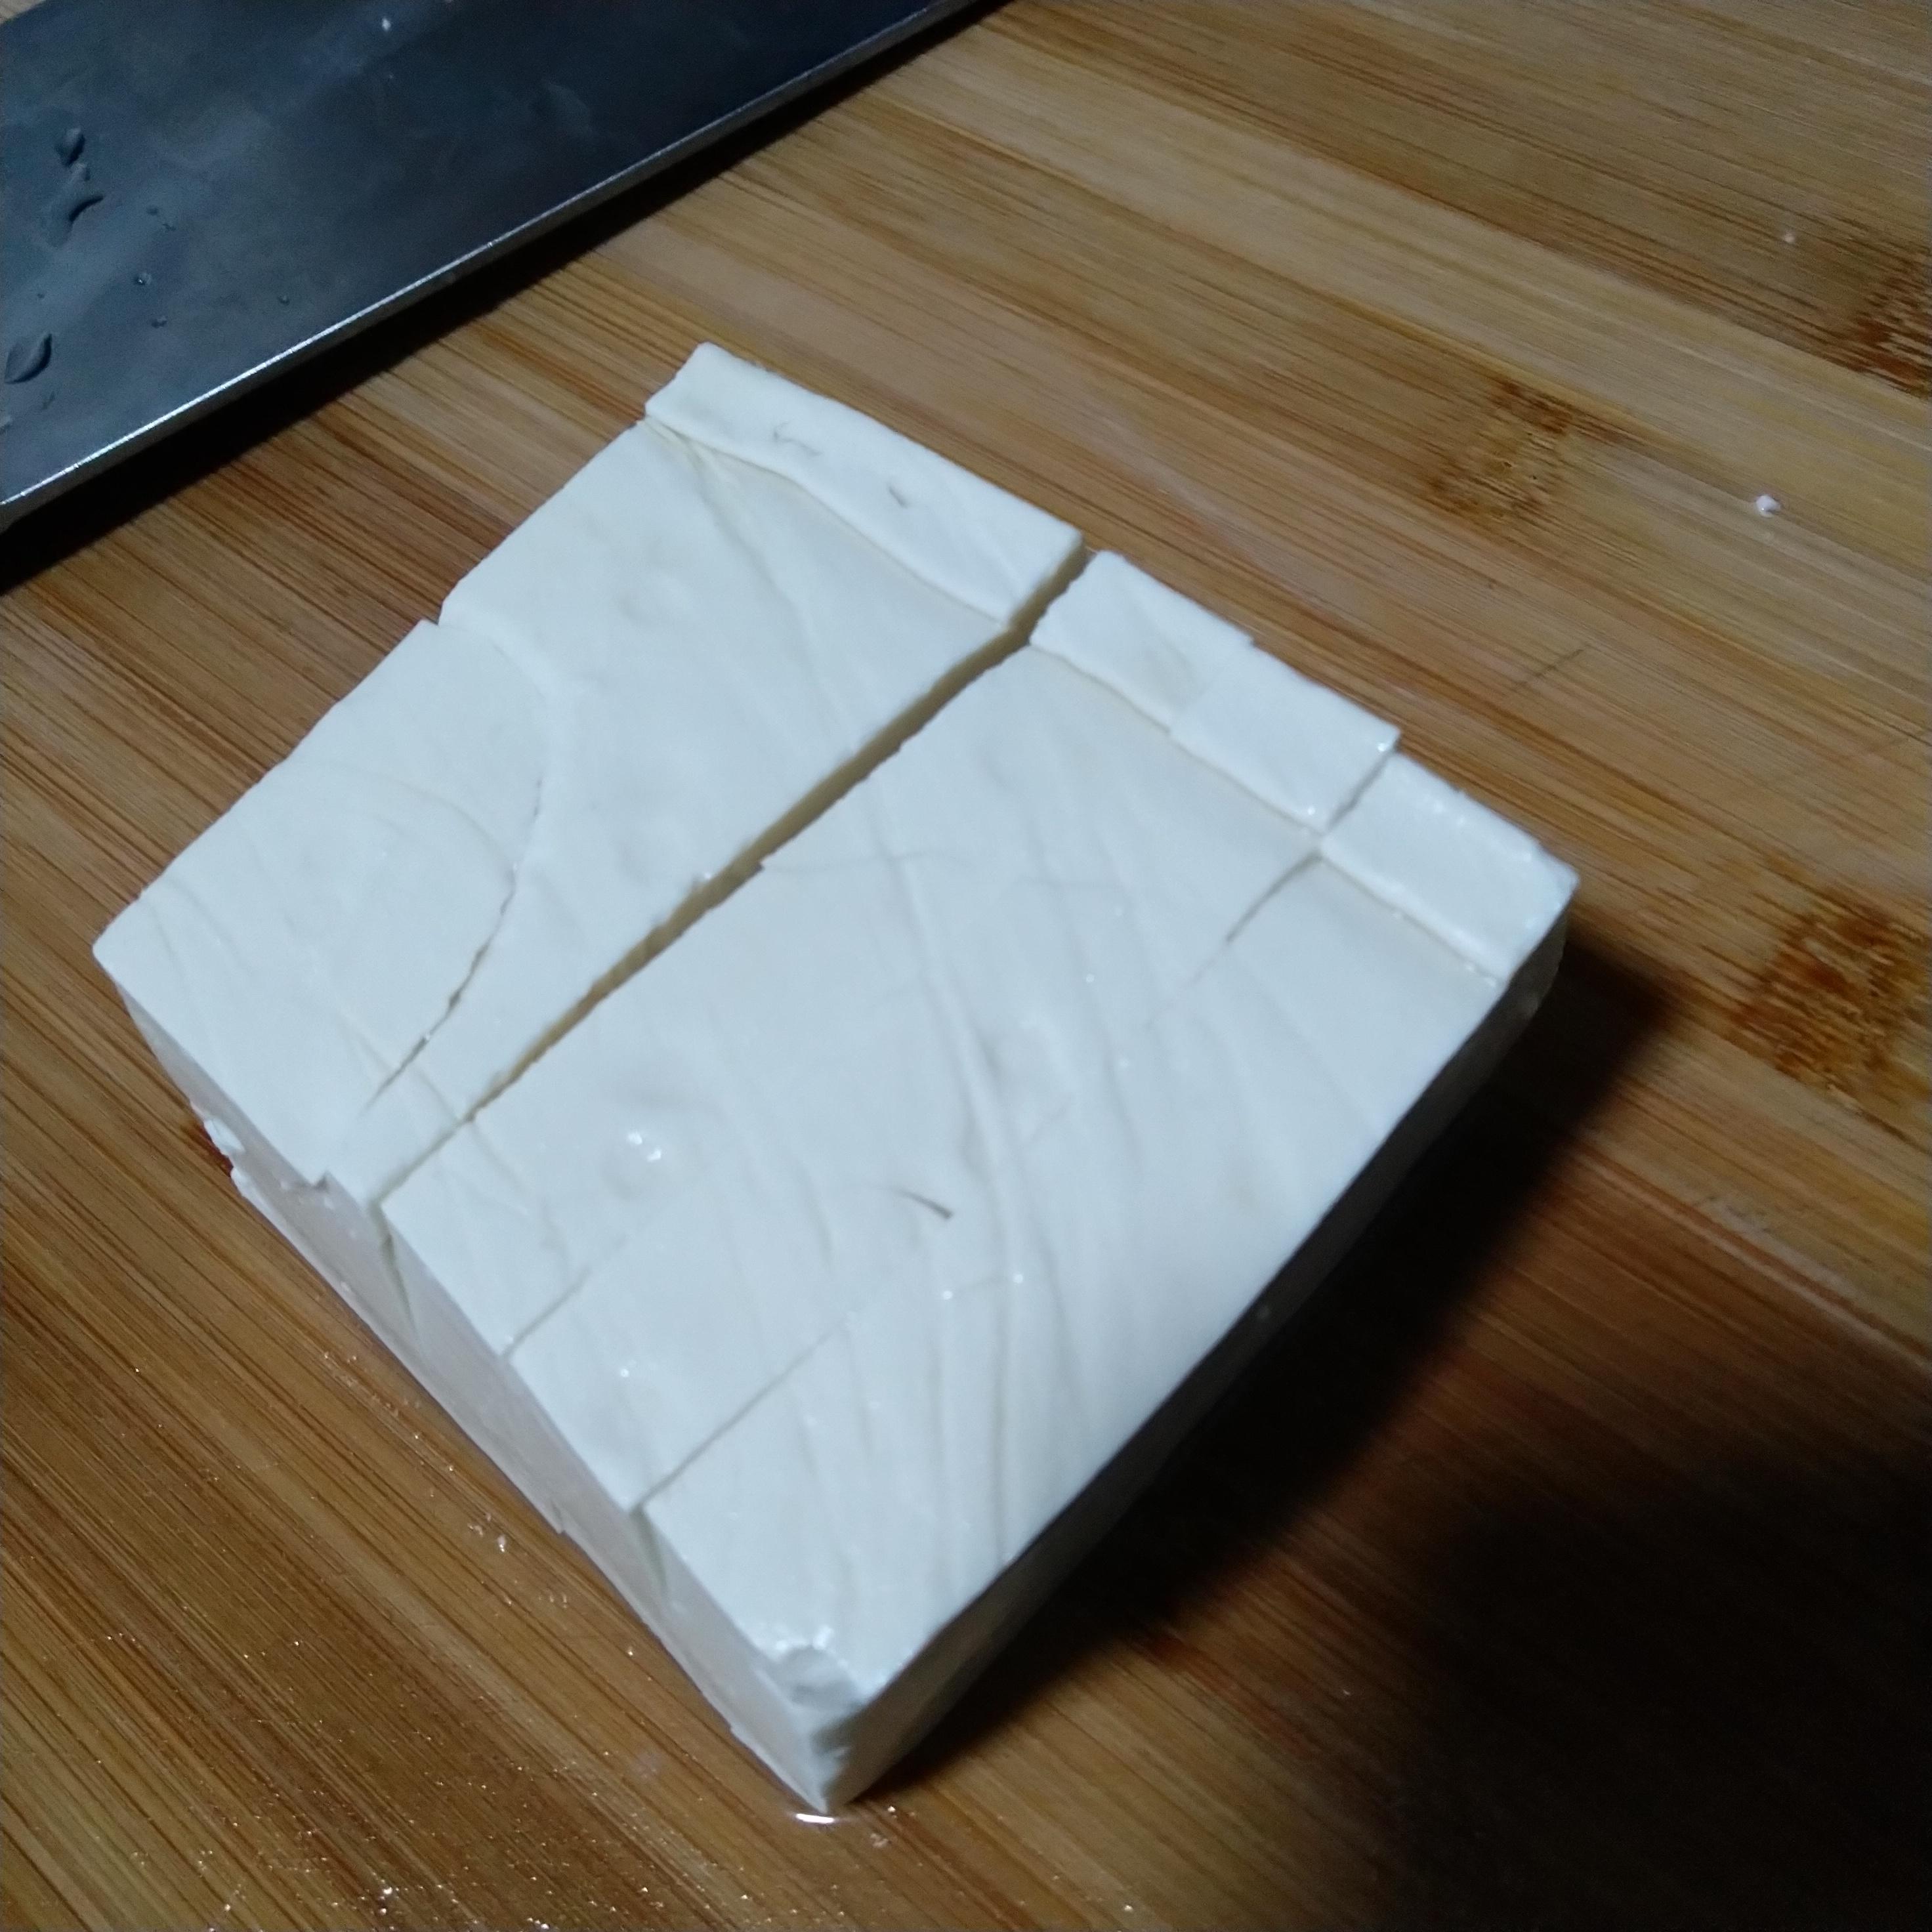 反向切豆腐